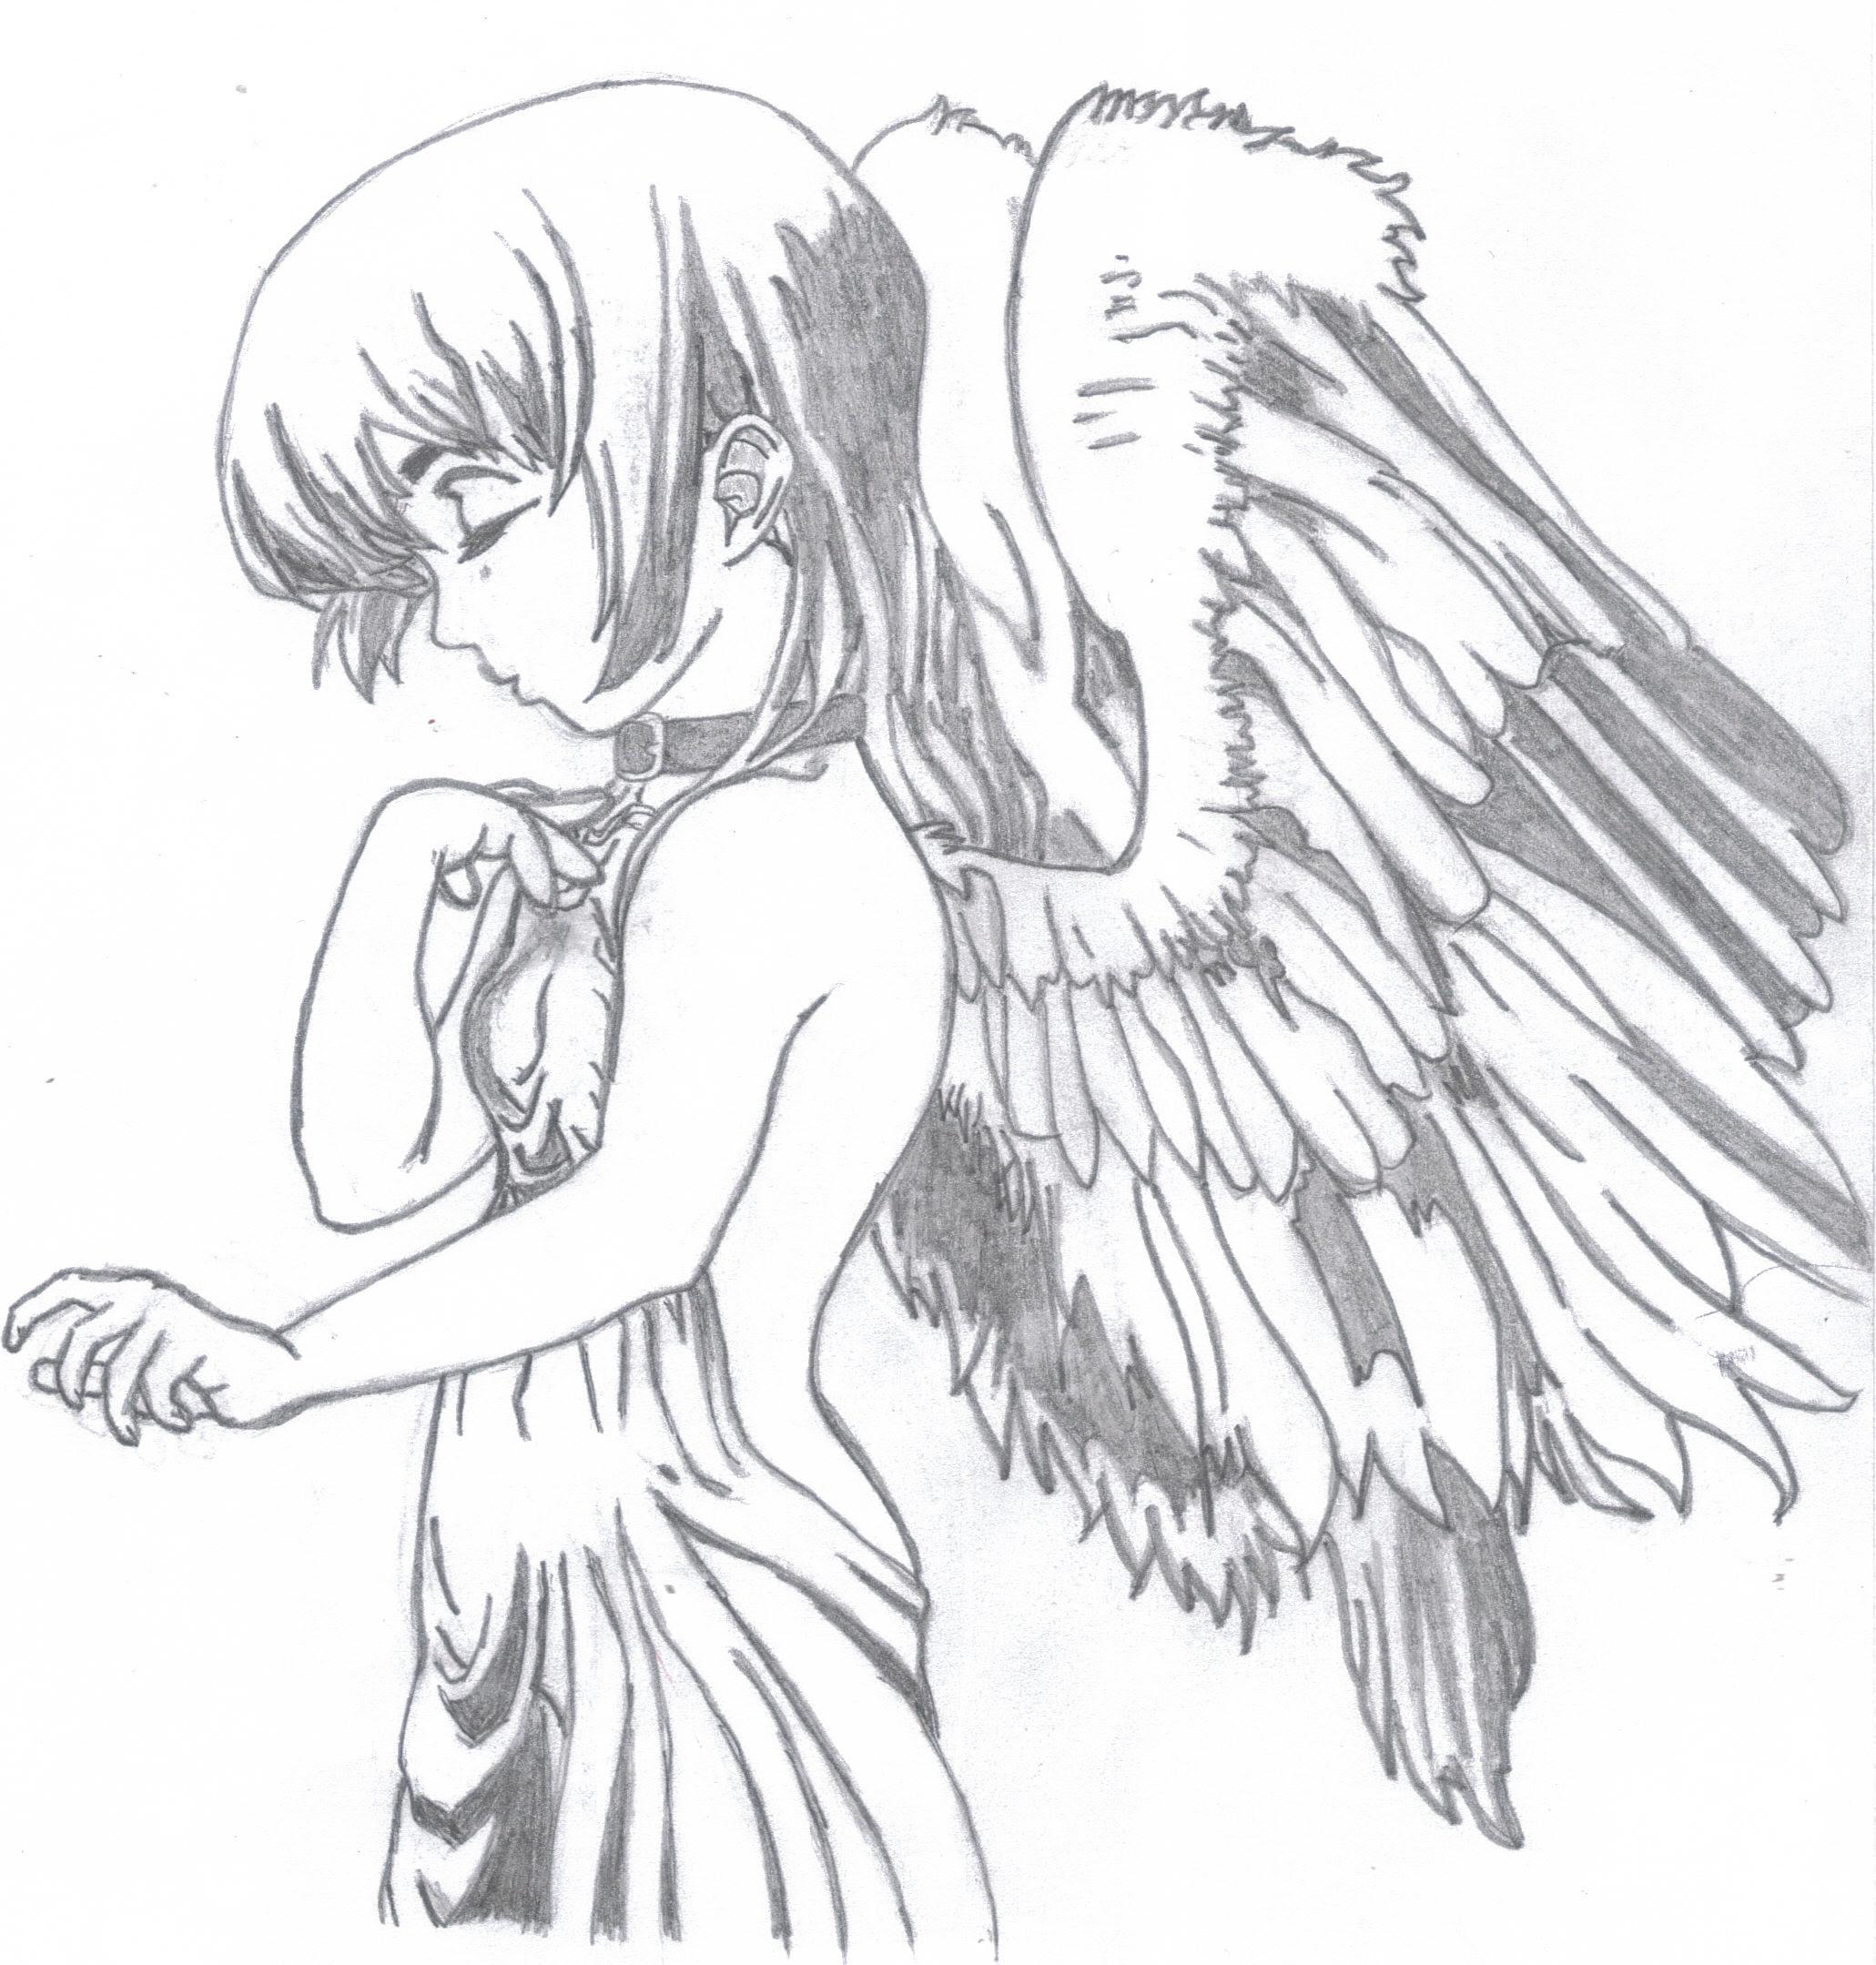 Anime angel girl drawings ruang belajar siswa kelas 10